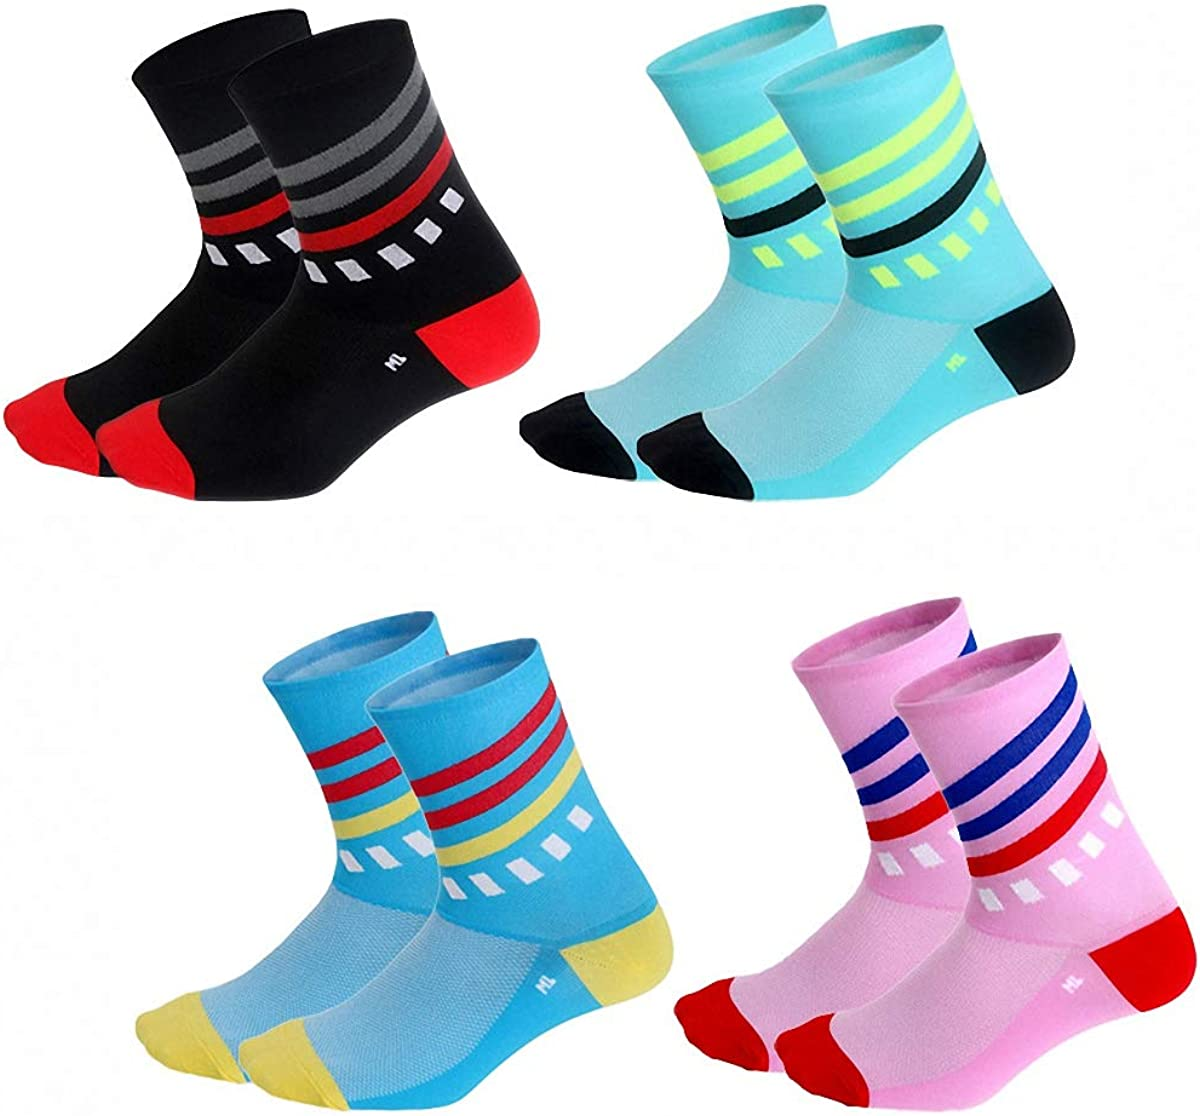 Cycling Socks Running Outdoor Sports Compression Bike Sock Men Women Comfortable